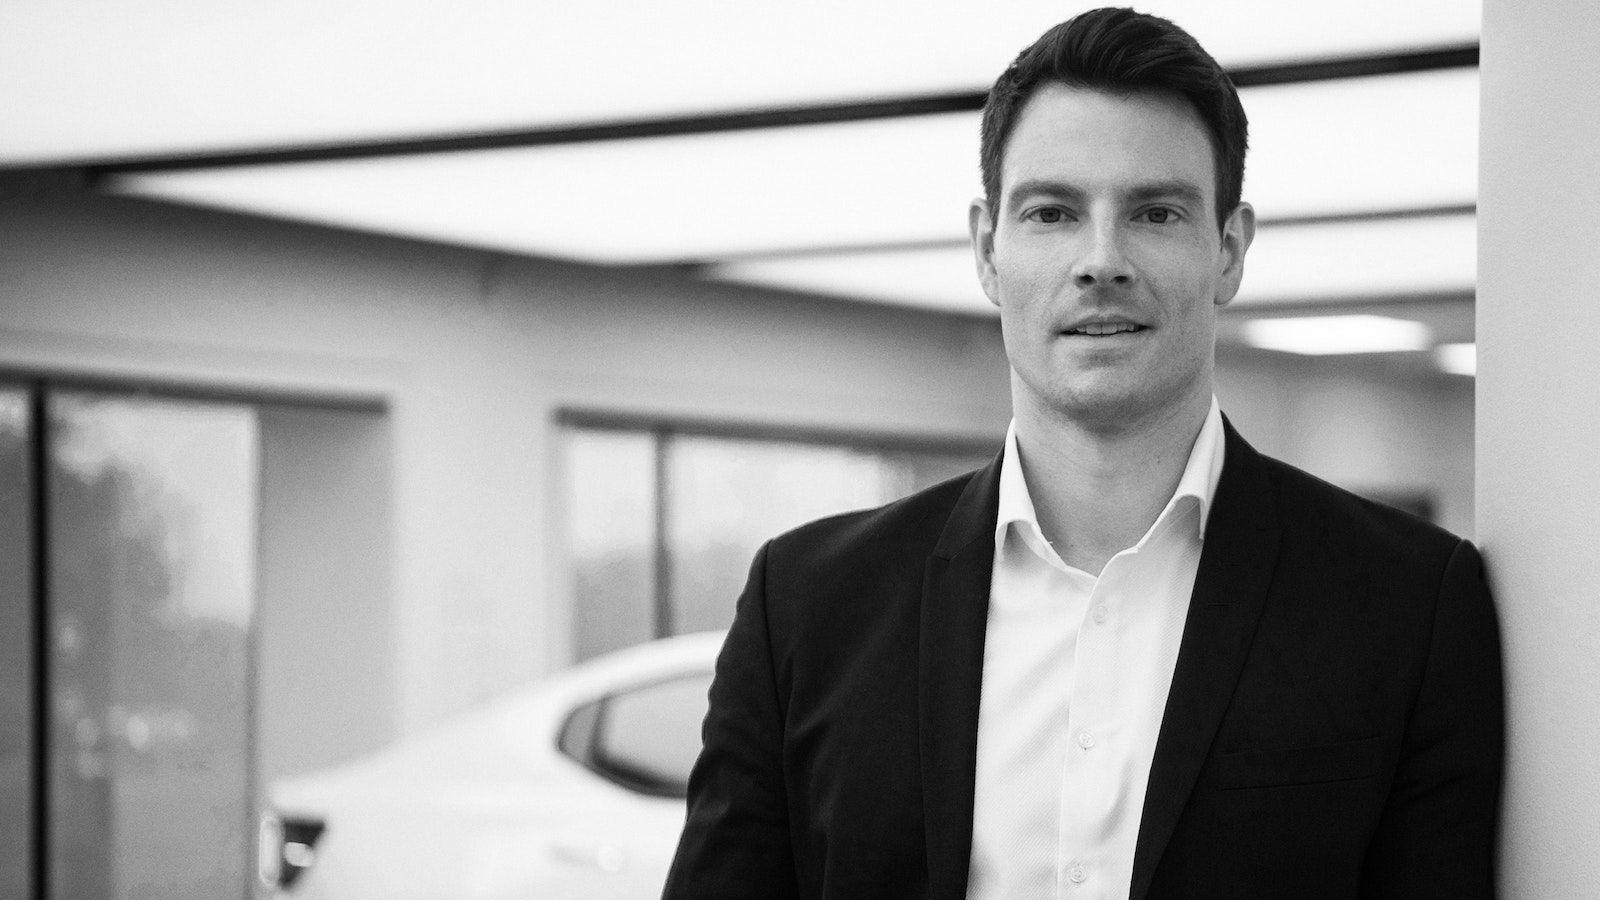 Star of 2021: Alexander Lutz Managing Director of Polestar Germany